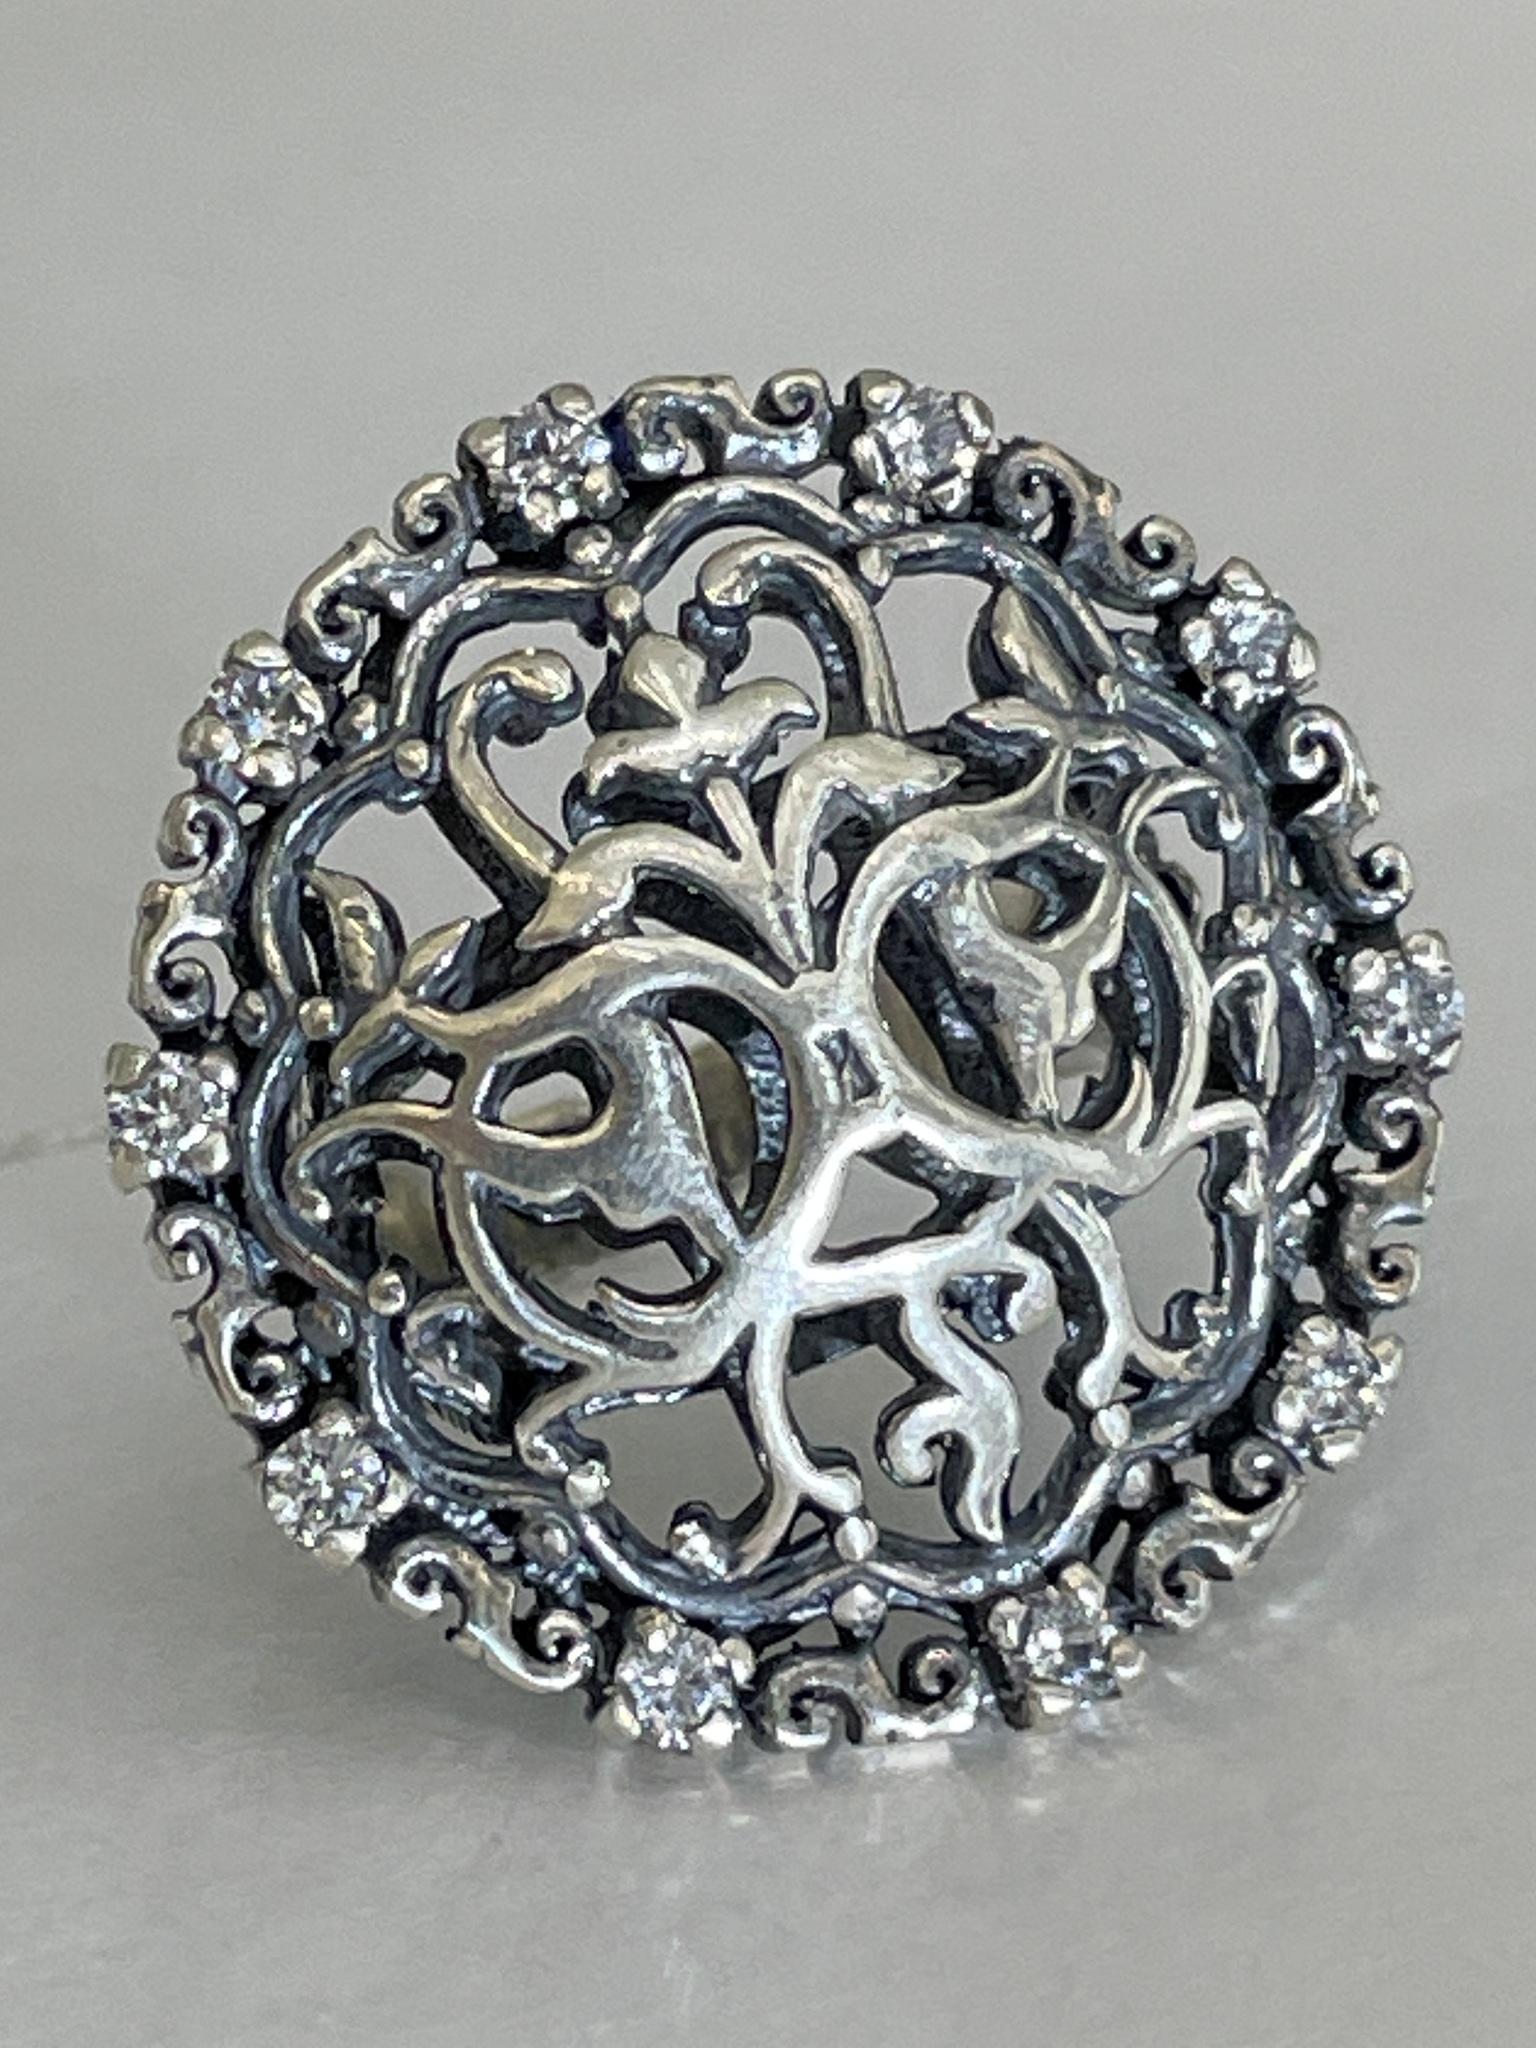 Самарканд (кольцо из серебра)